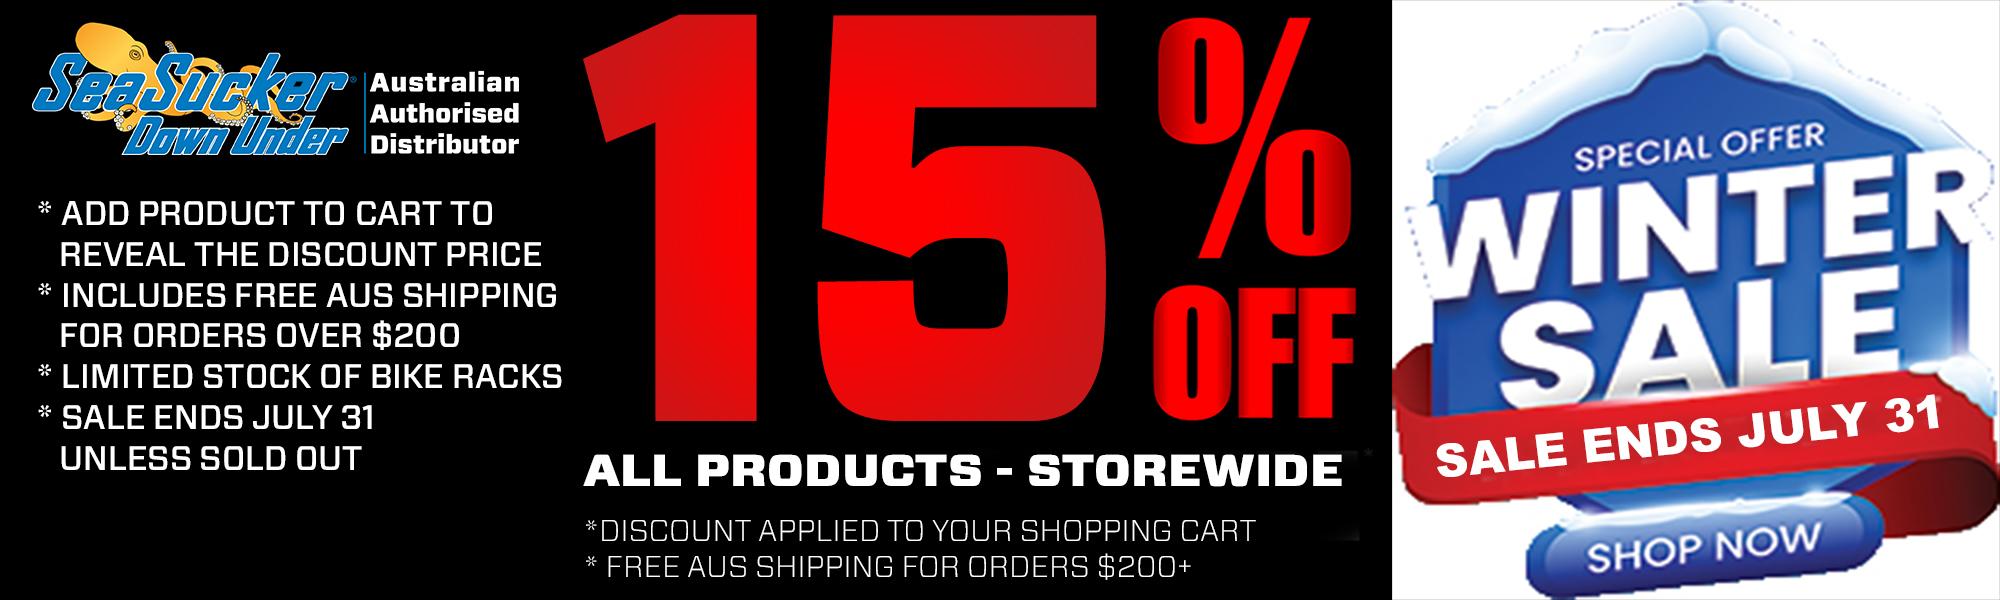 SeaSucker Down Under Winter Sale 15% off